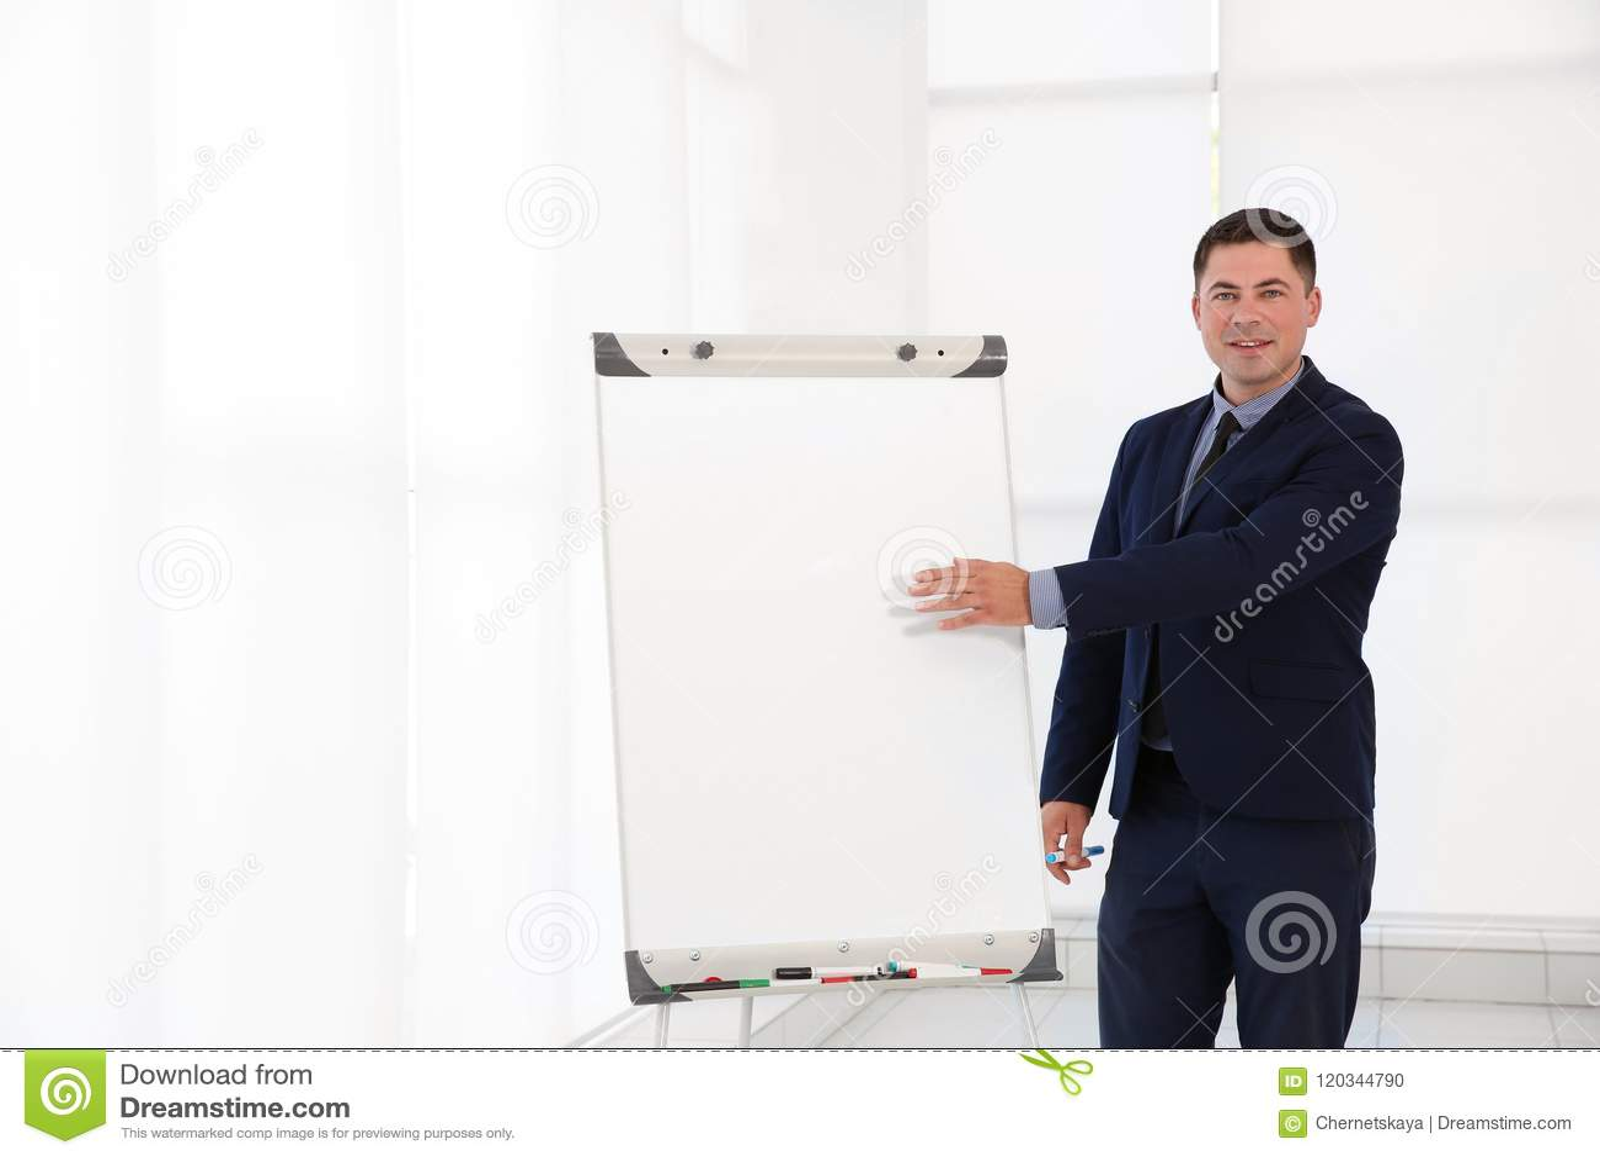 Business trainer giving presentation